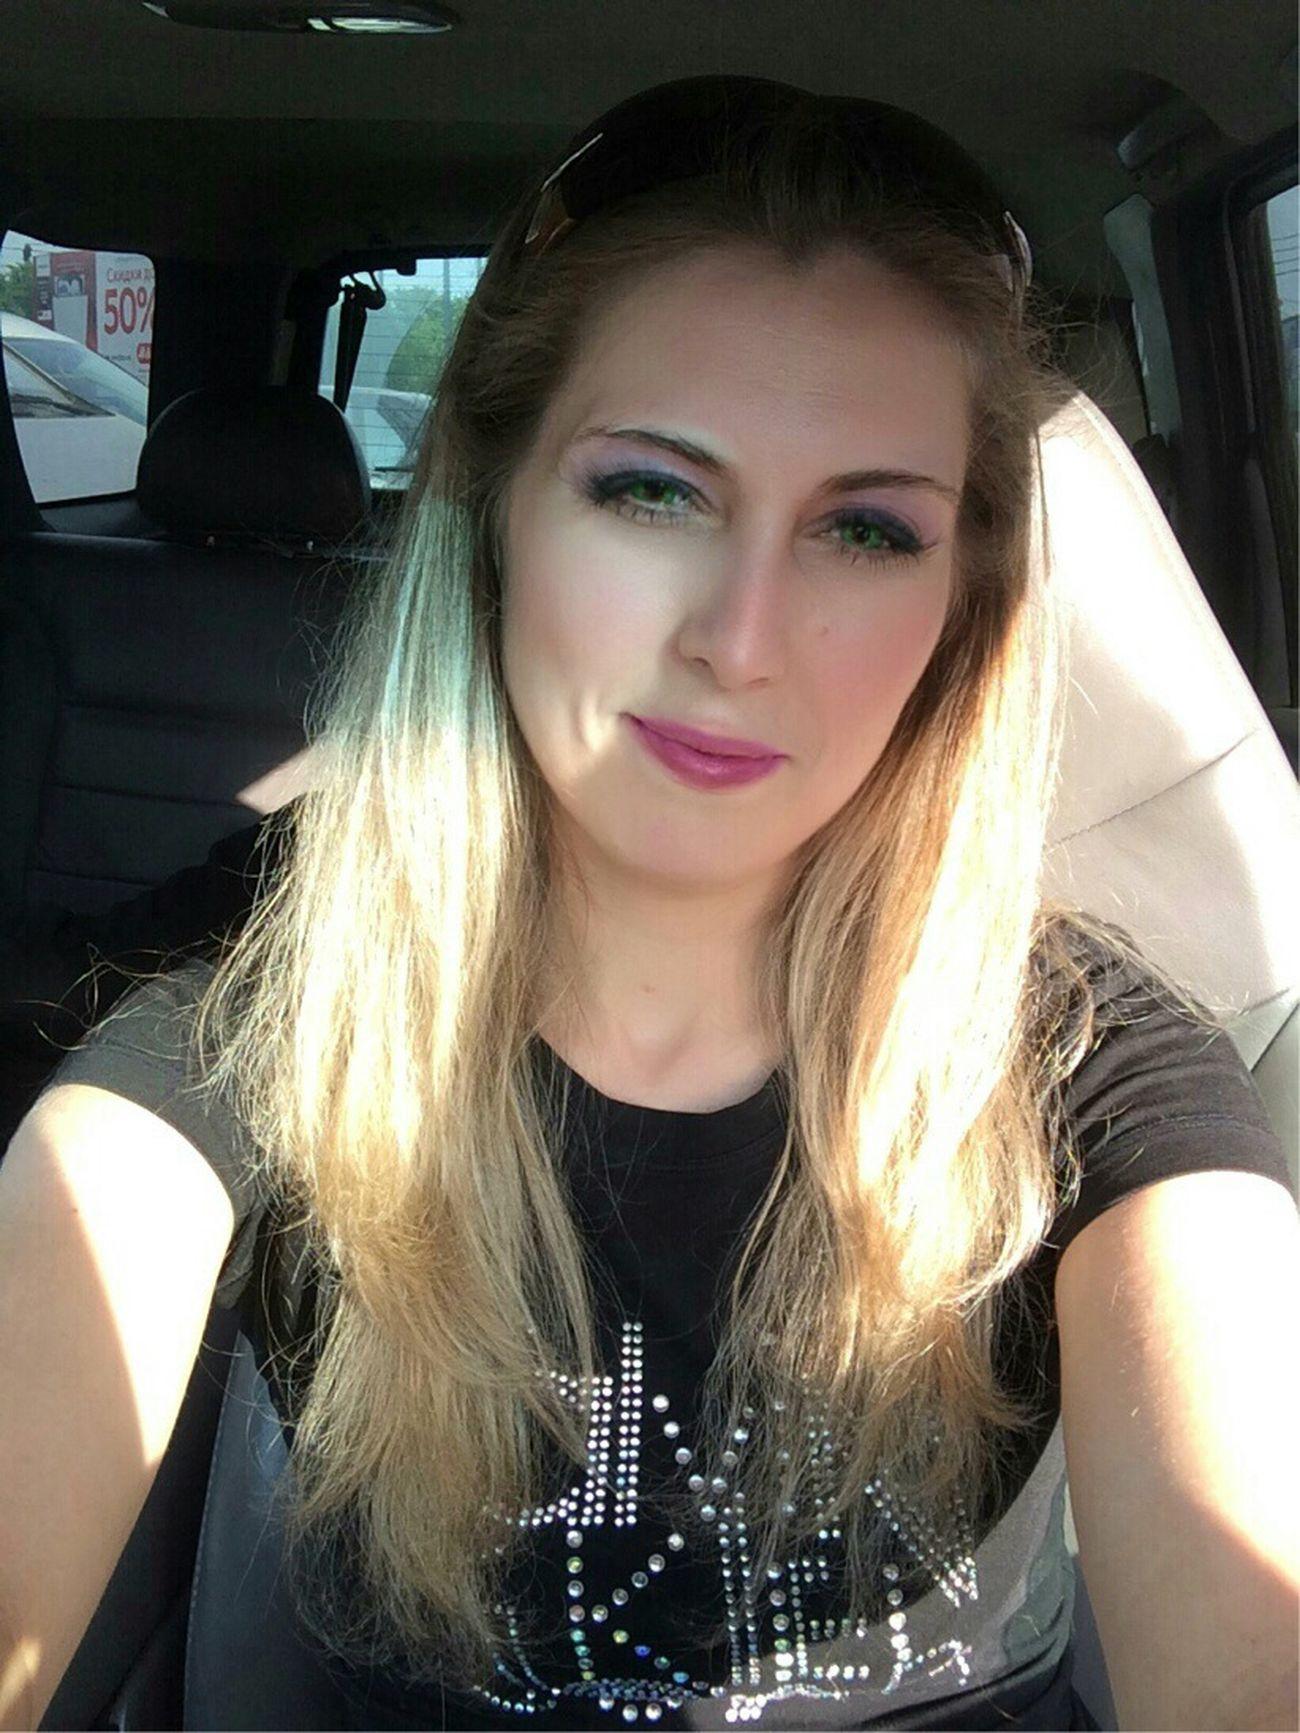 Photography Model Girl Selfie